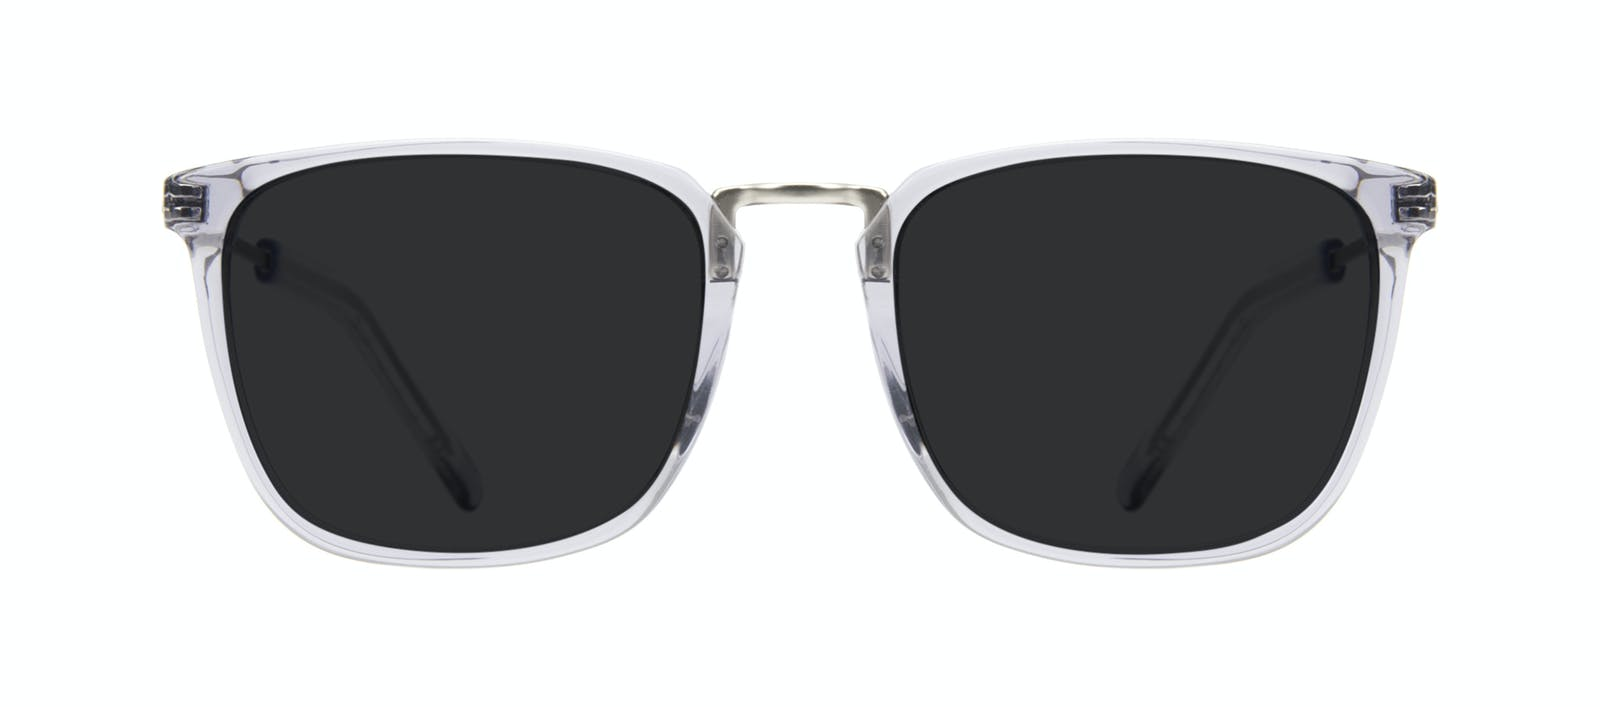 efd4e6b658 Men s Sunglasses - Current in Steel